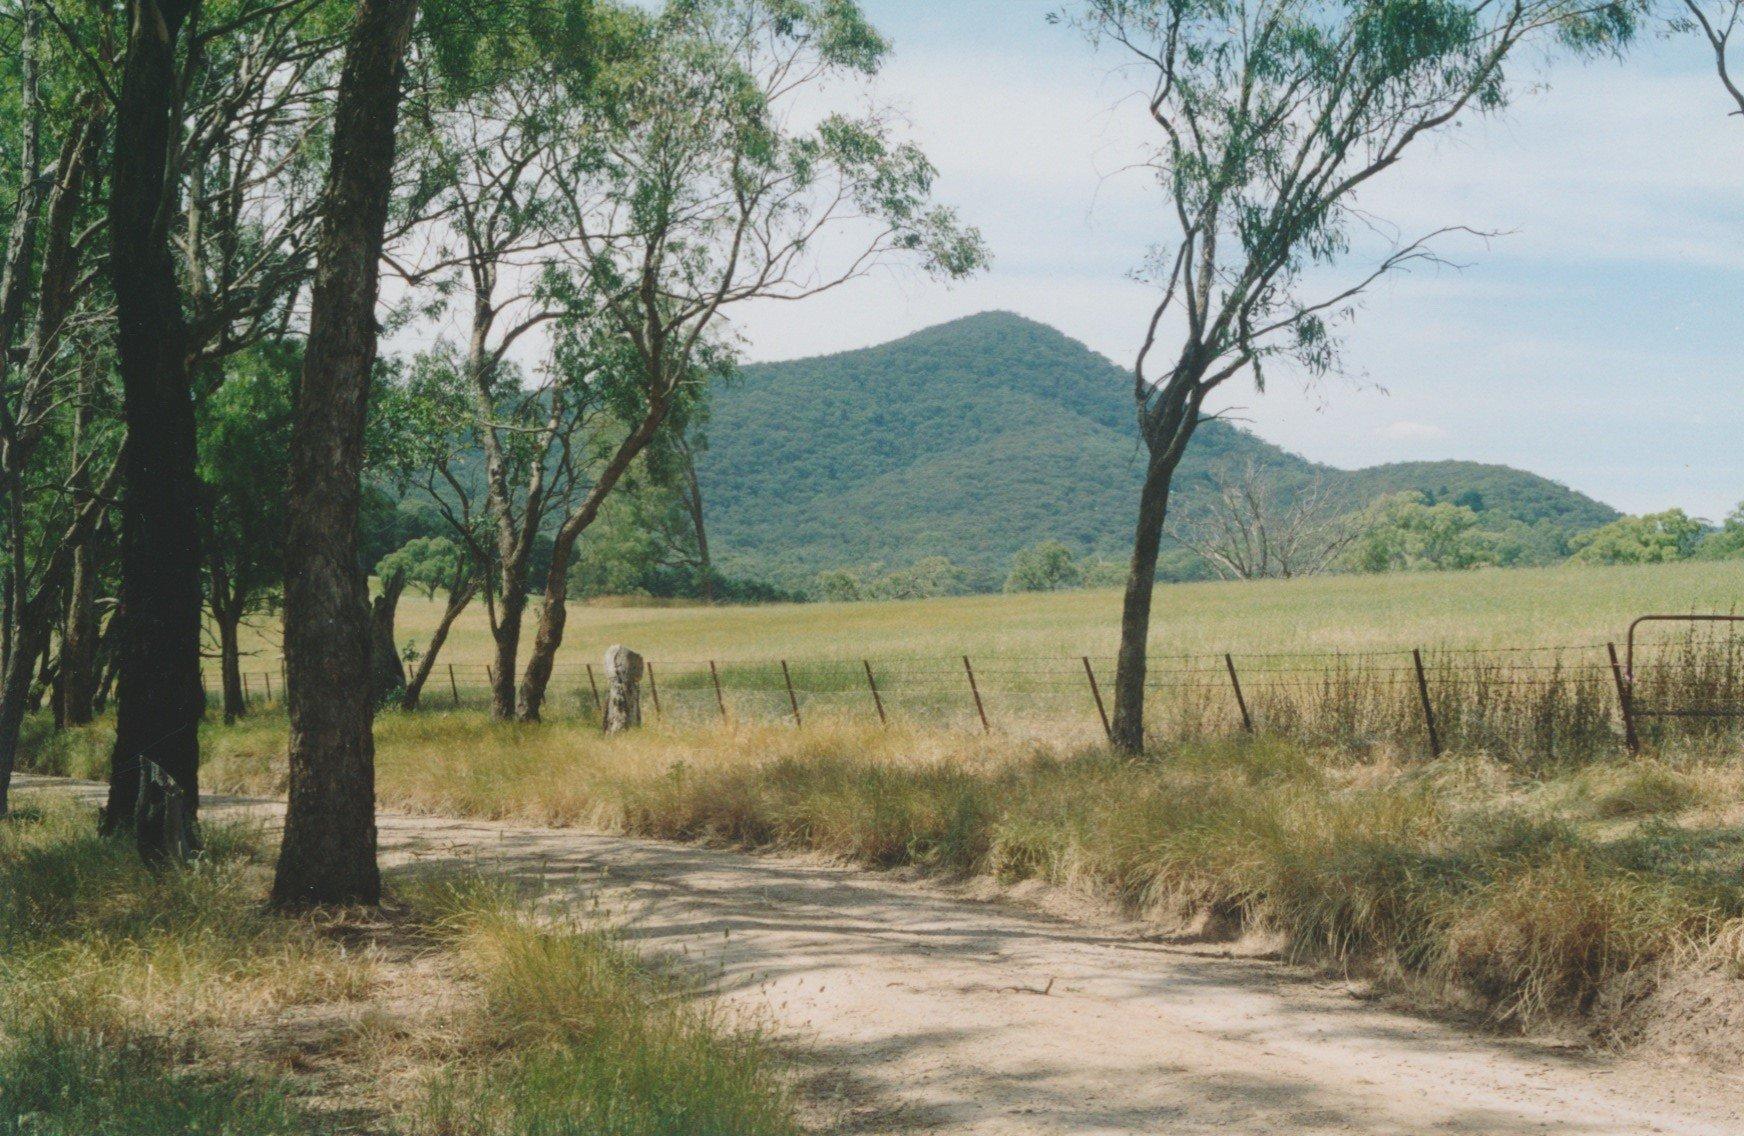 Mount Sugarloaf from Minchins Road, Arthurs Creek, 2003